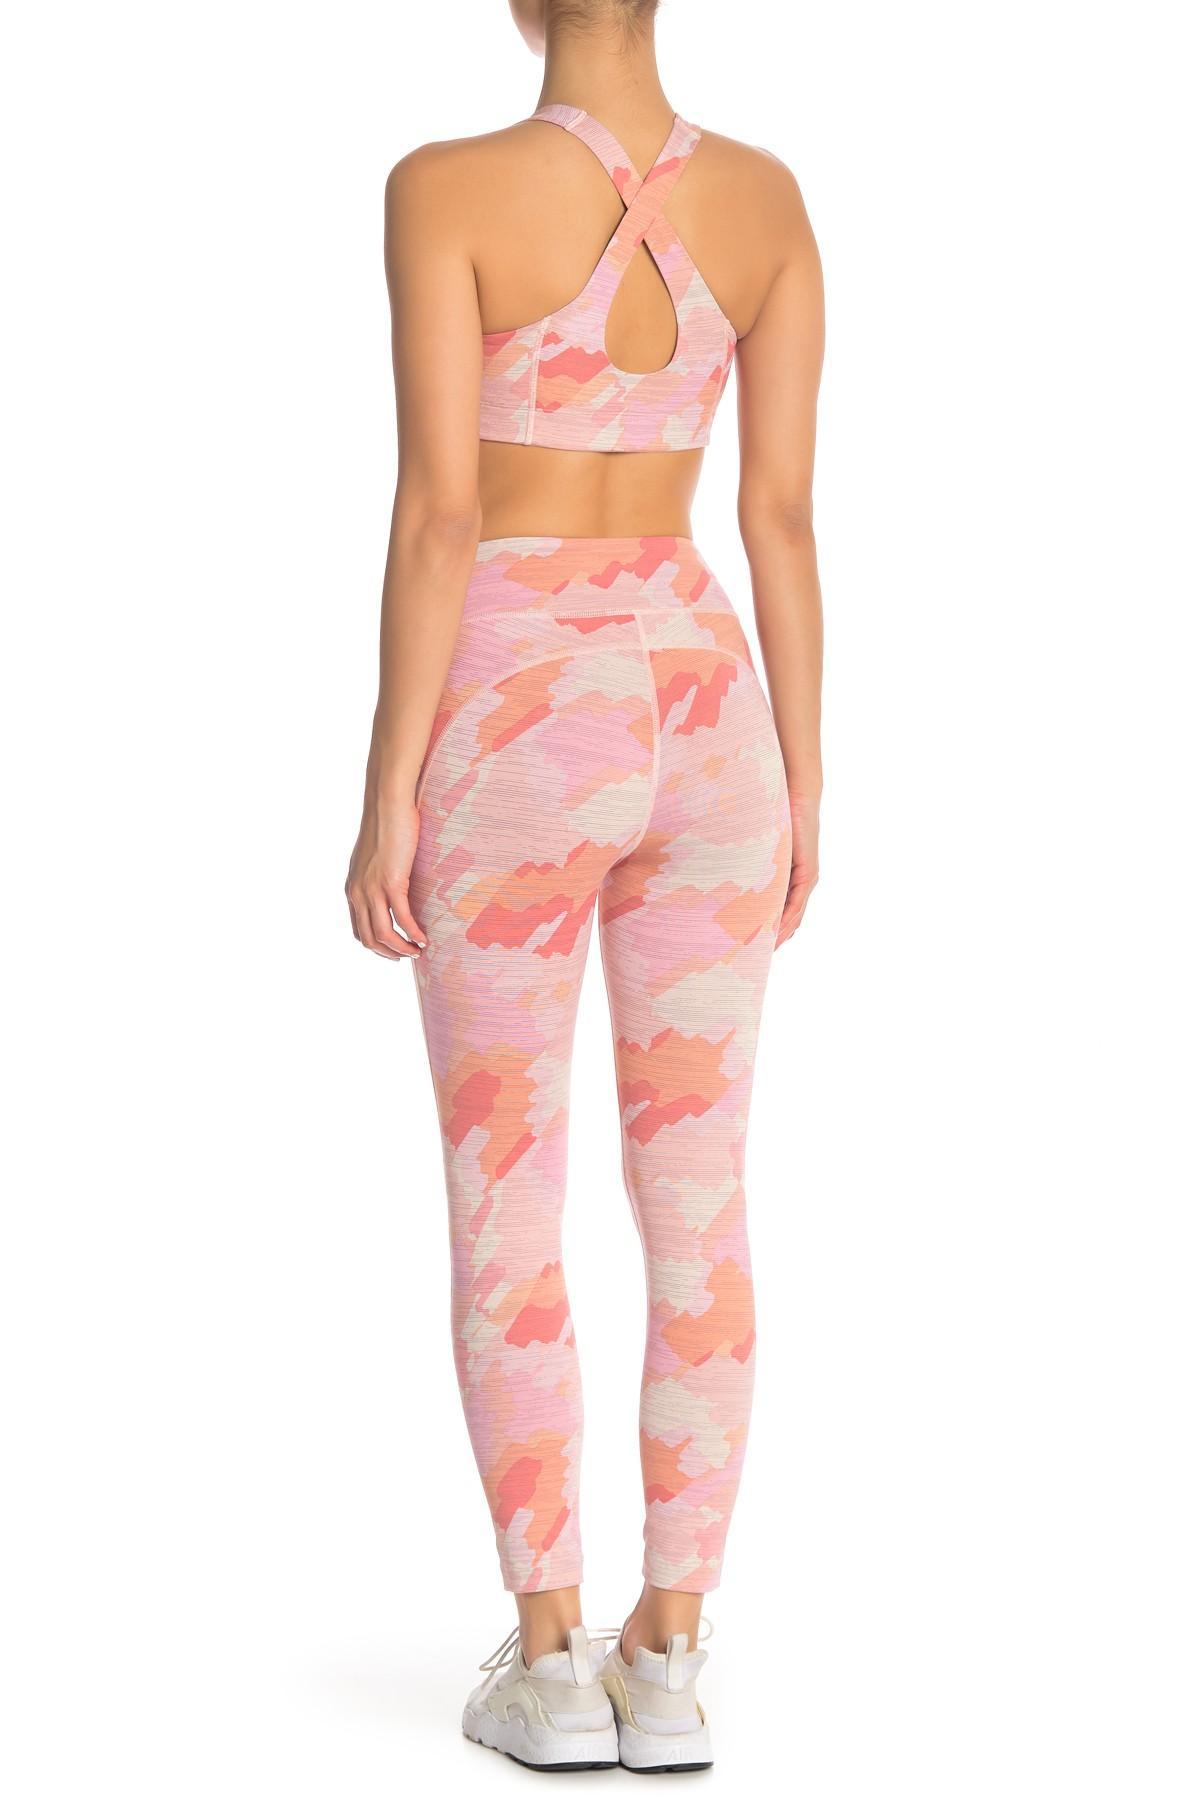 c66fac74fc45b Outdoor Voices Techsweat (tm) Flex Leggings in Pink - Lyst